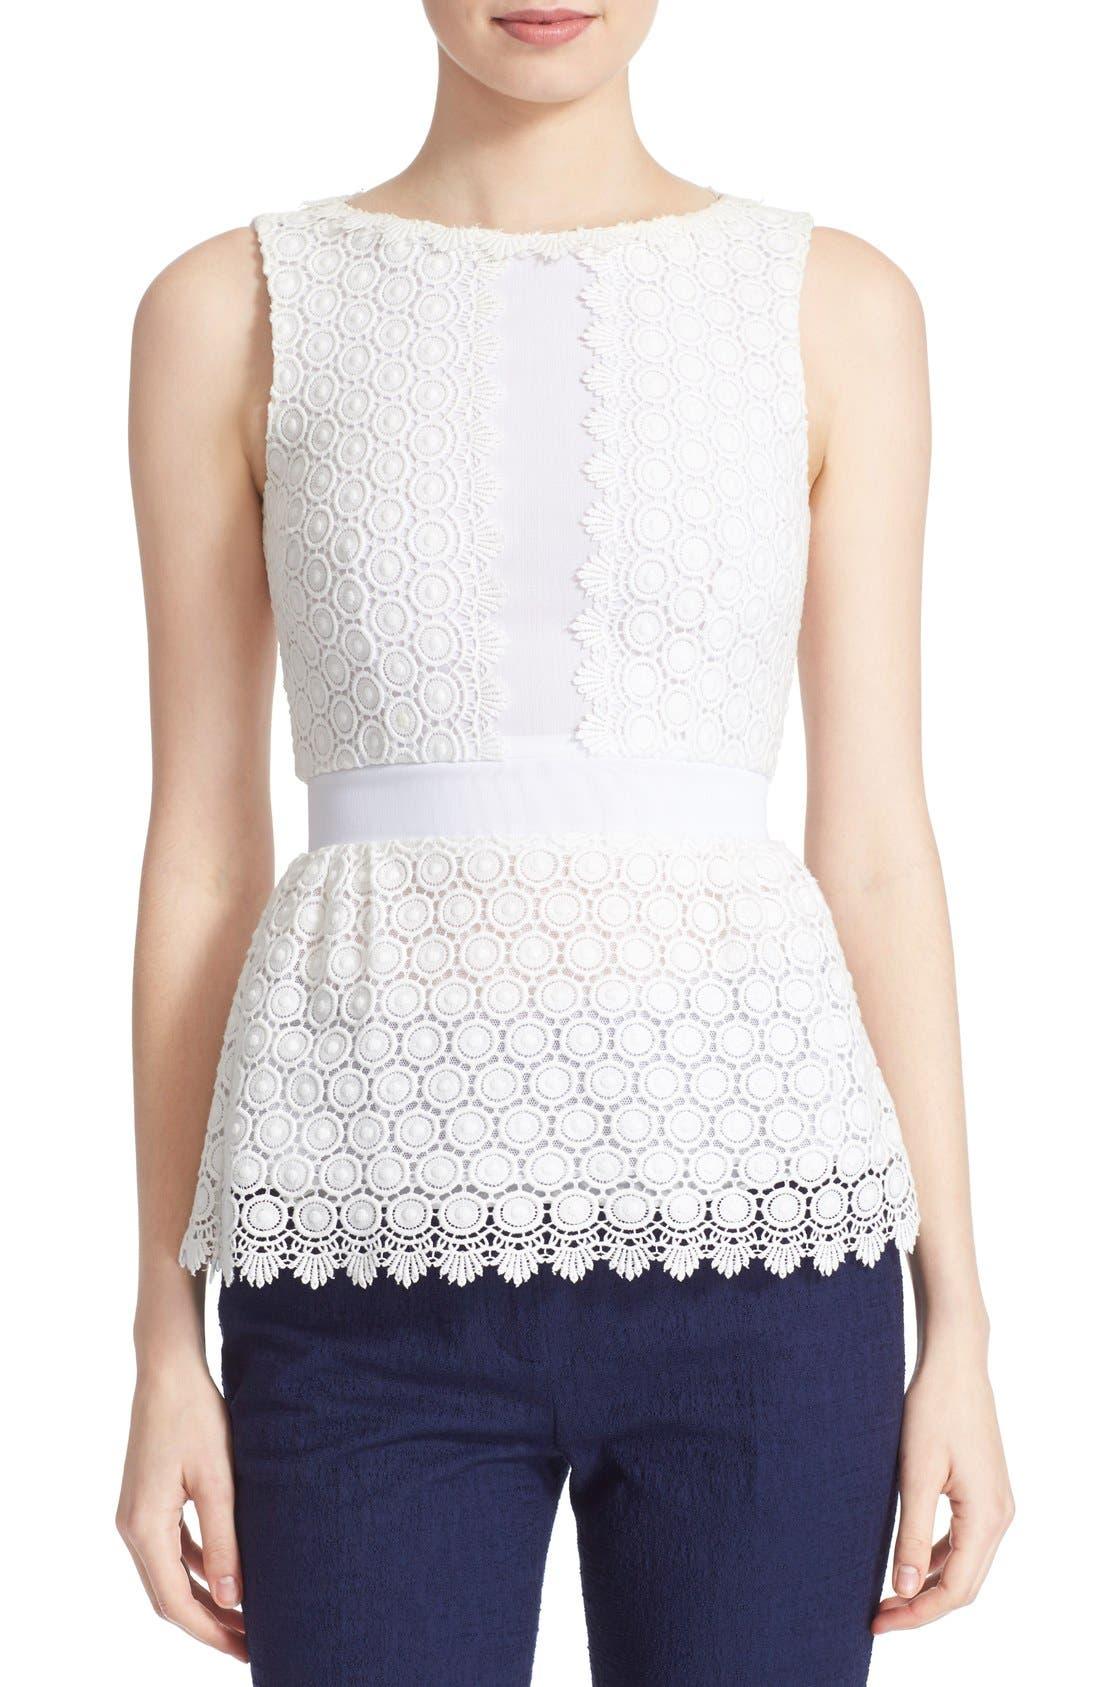 Alternate Image 1 Selected - Diane von Furstenberg 'Tavita' Sleeveless Lace Top